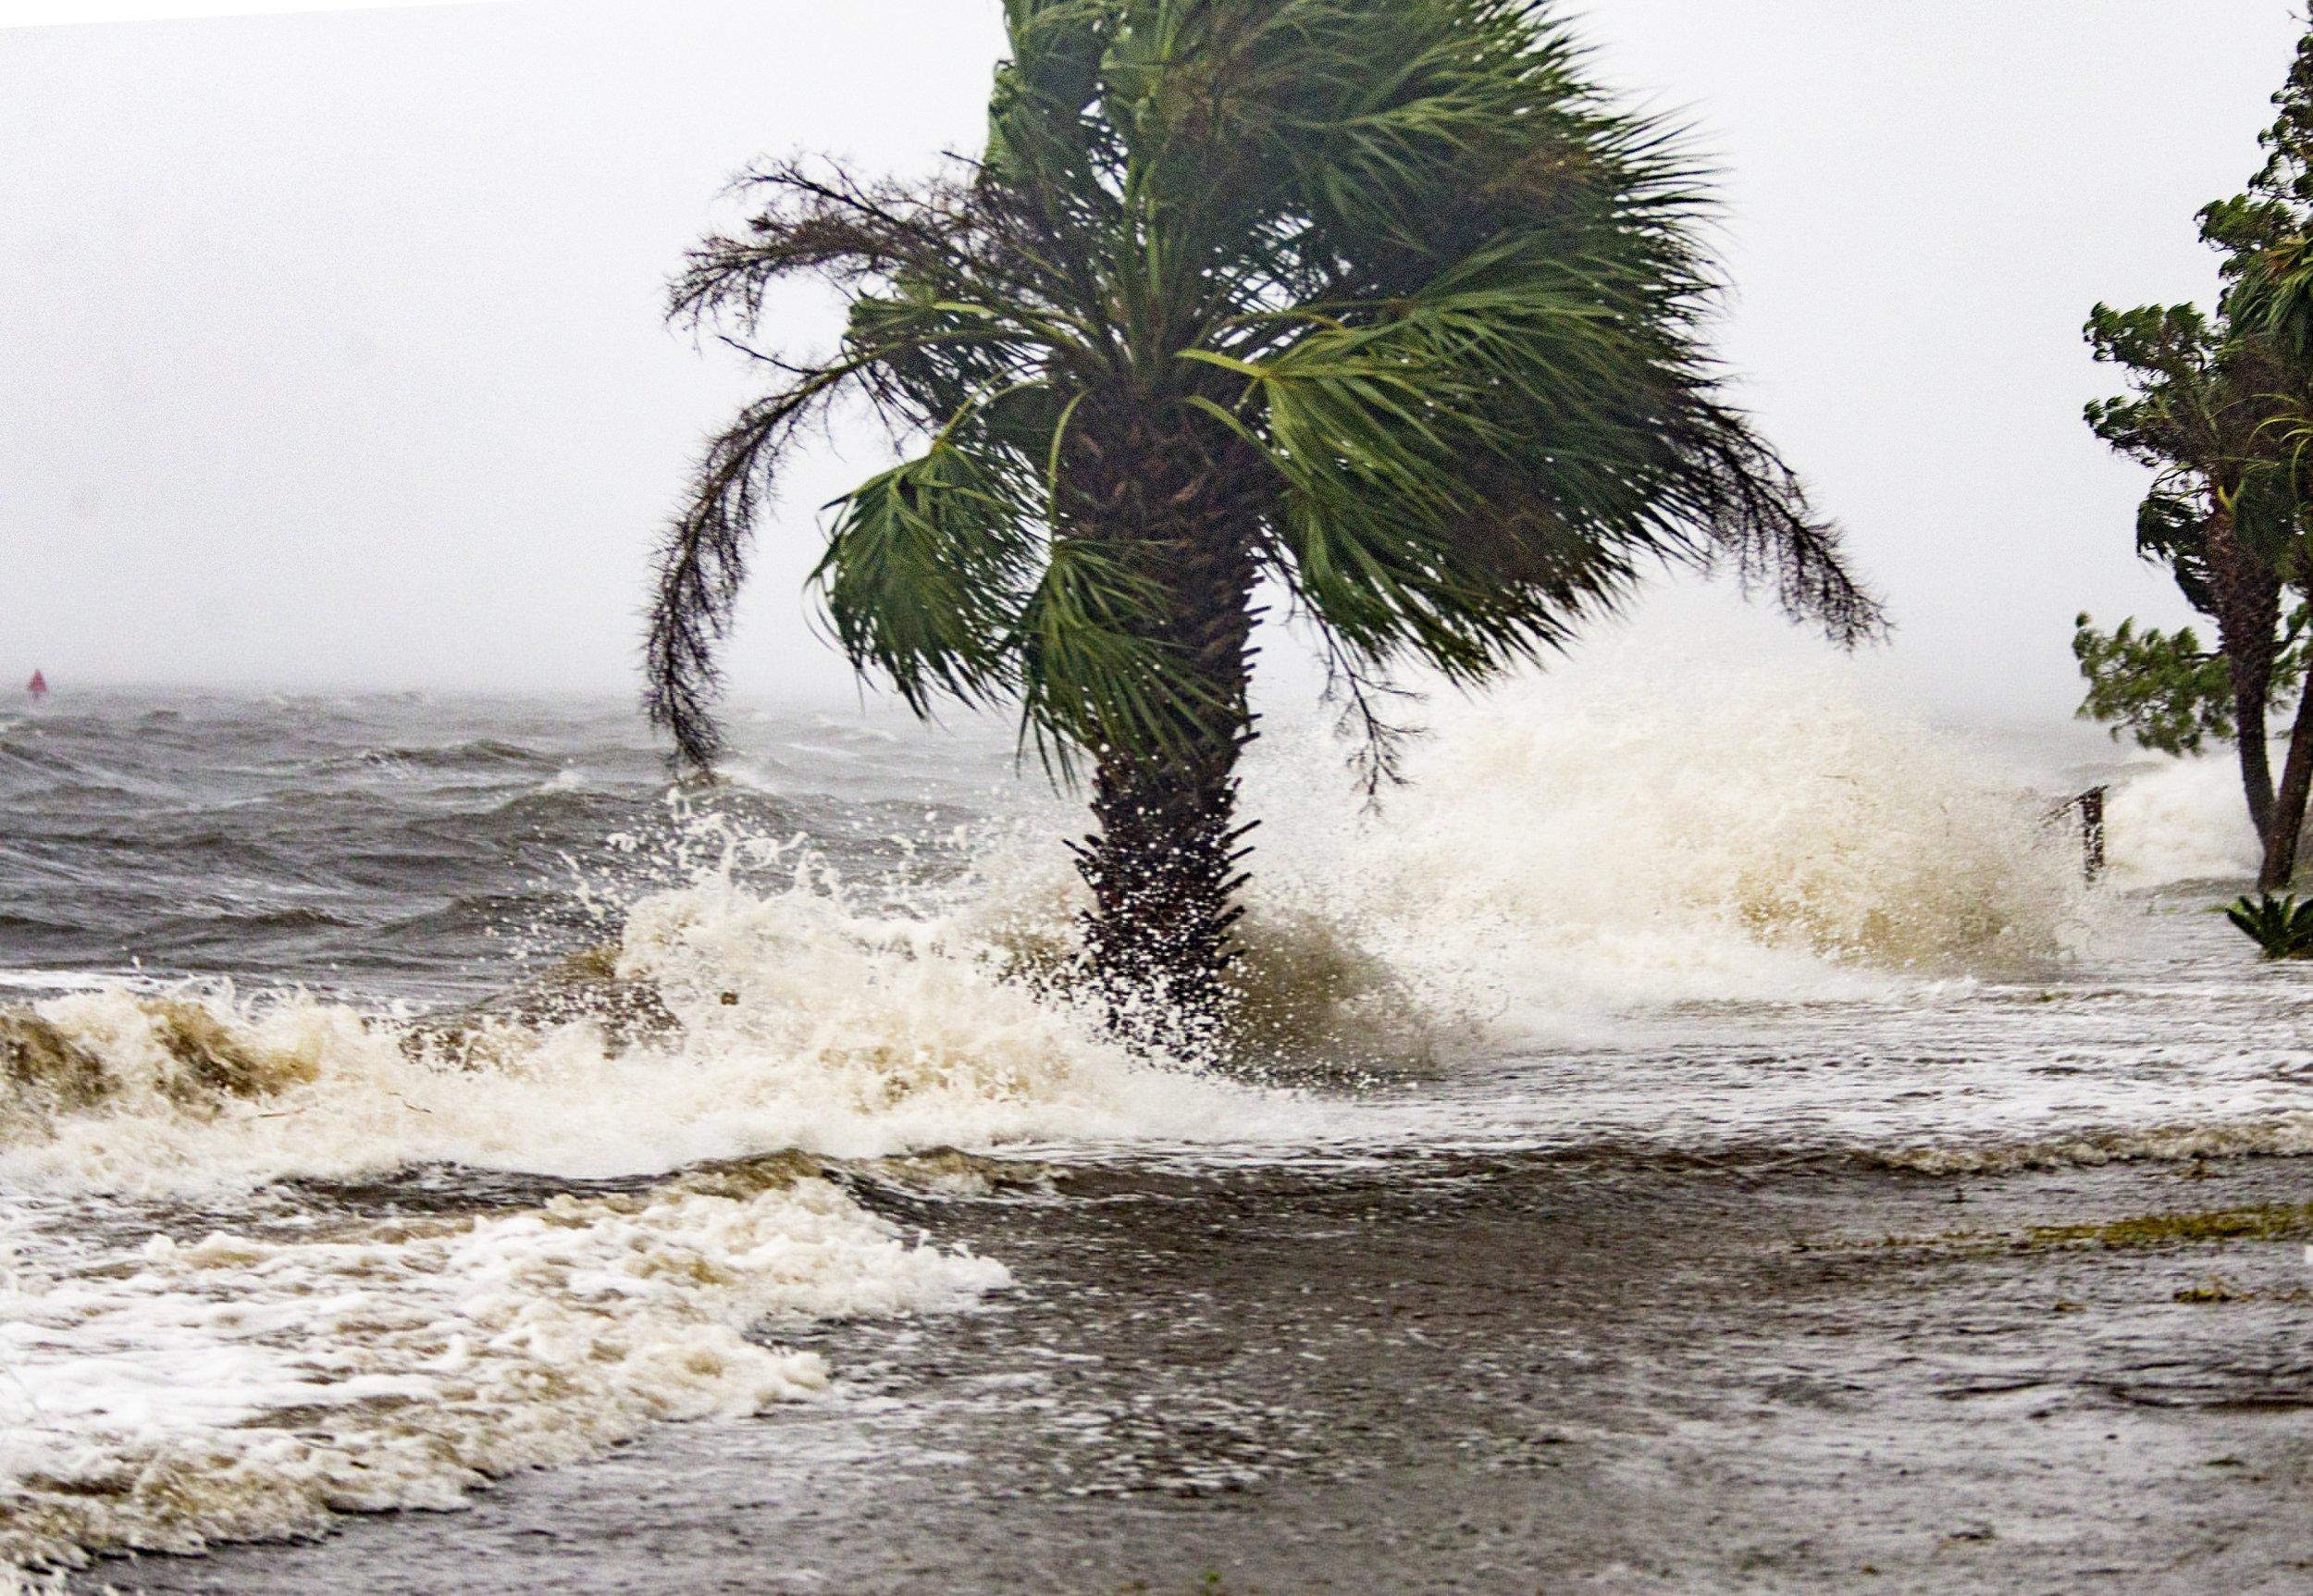 Hurricane Michael makes landfall, damages homes, properties